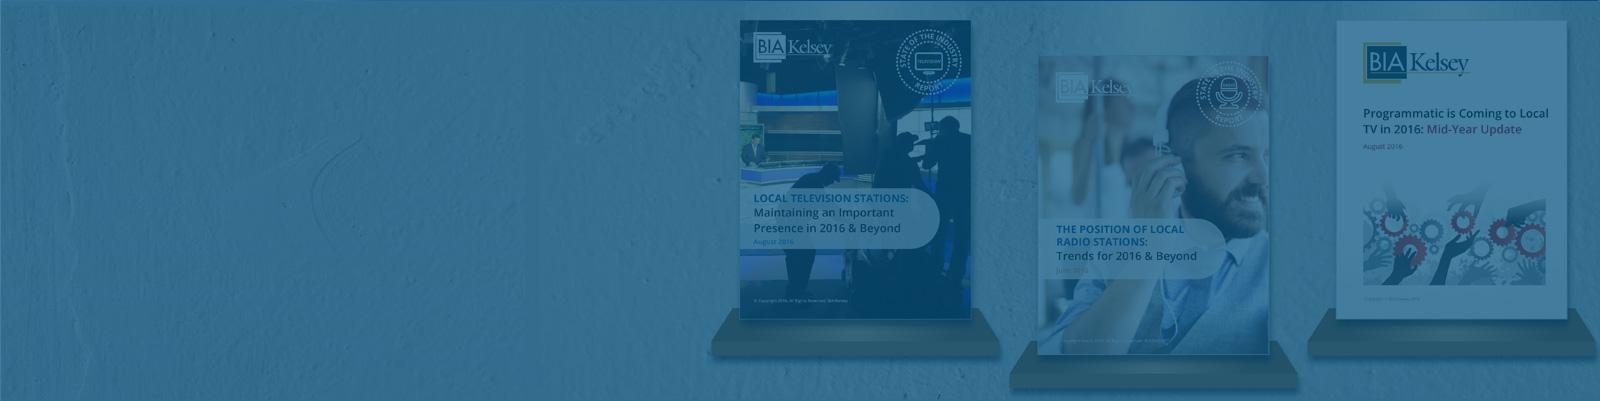 SOITV-SOI-Radio-Programmatic-Update-Report-for-BIAK-Homepage-w-Blue-Overlay